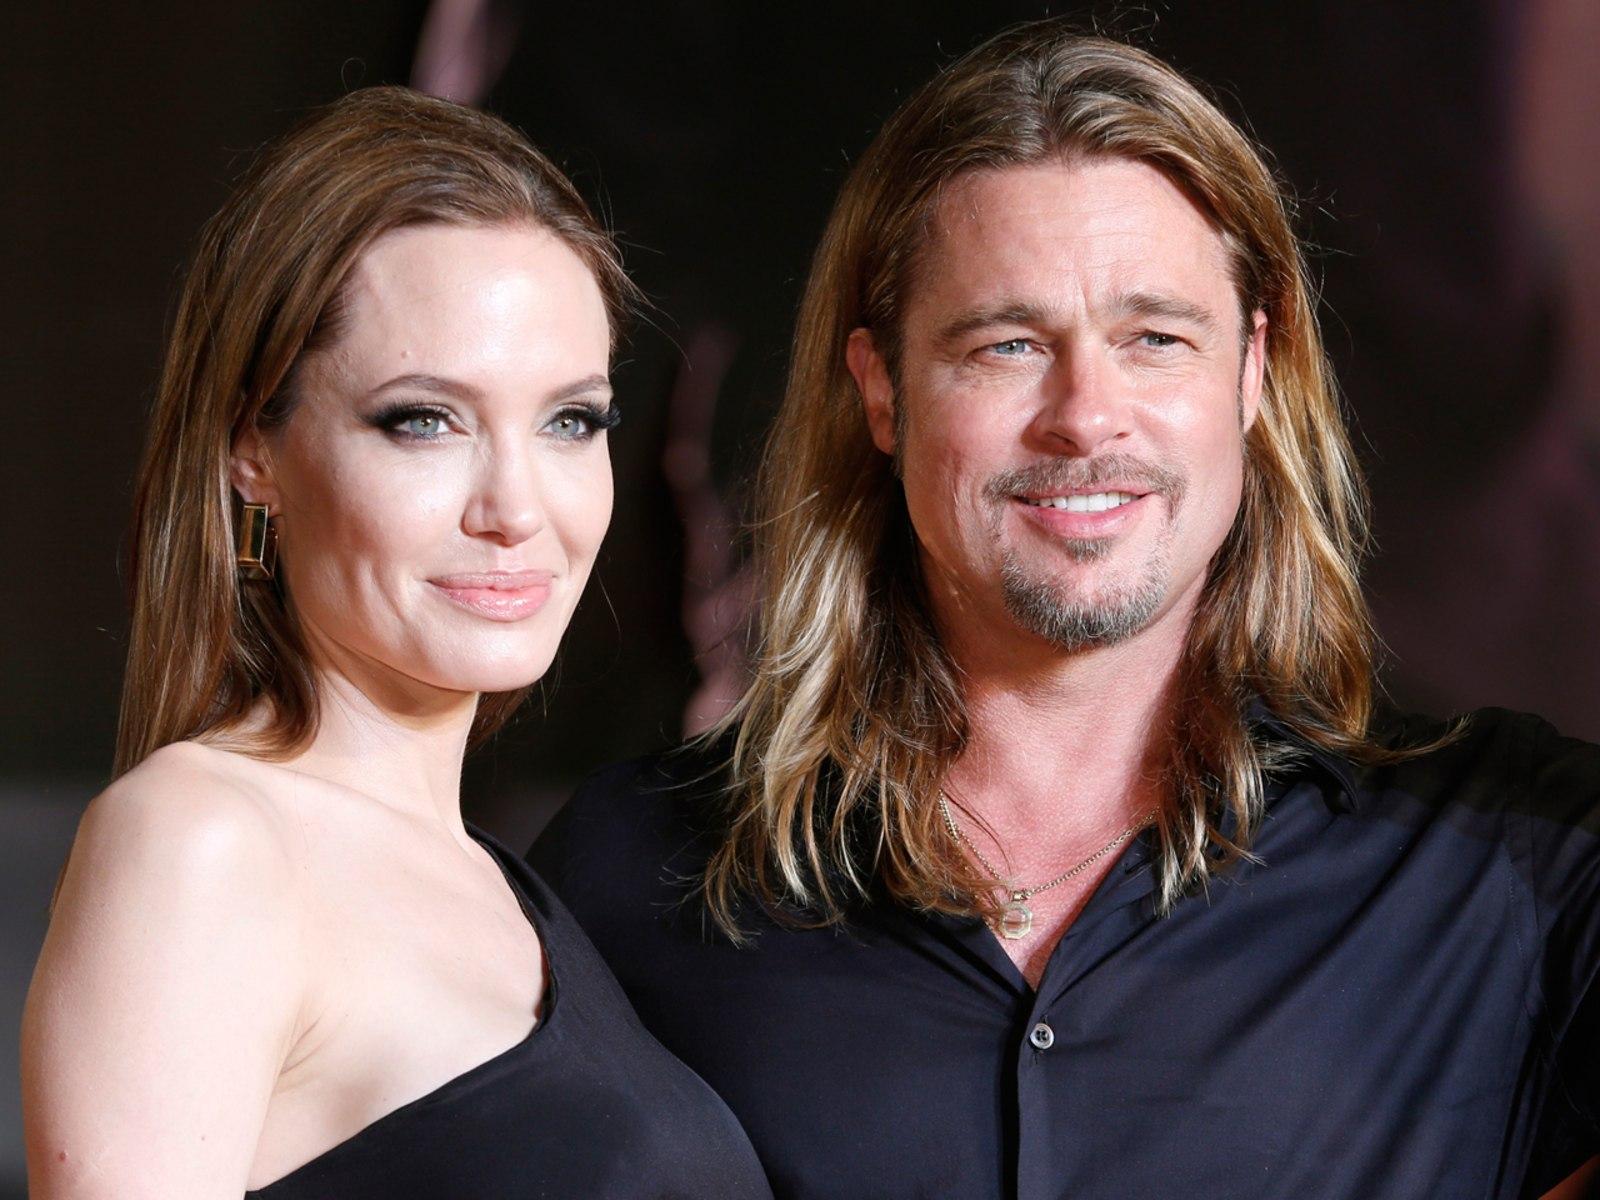 Image: Brad Pitt, Angelina Jolie